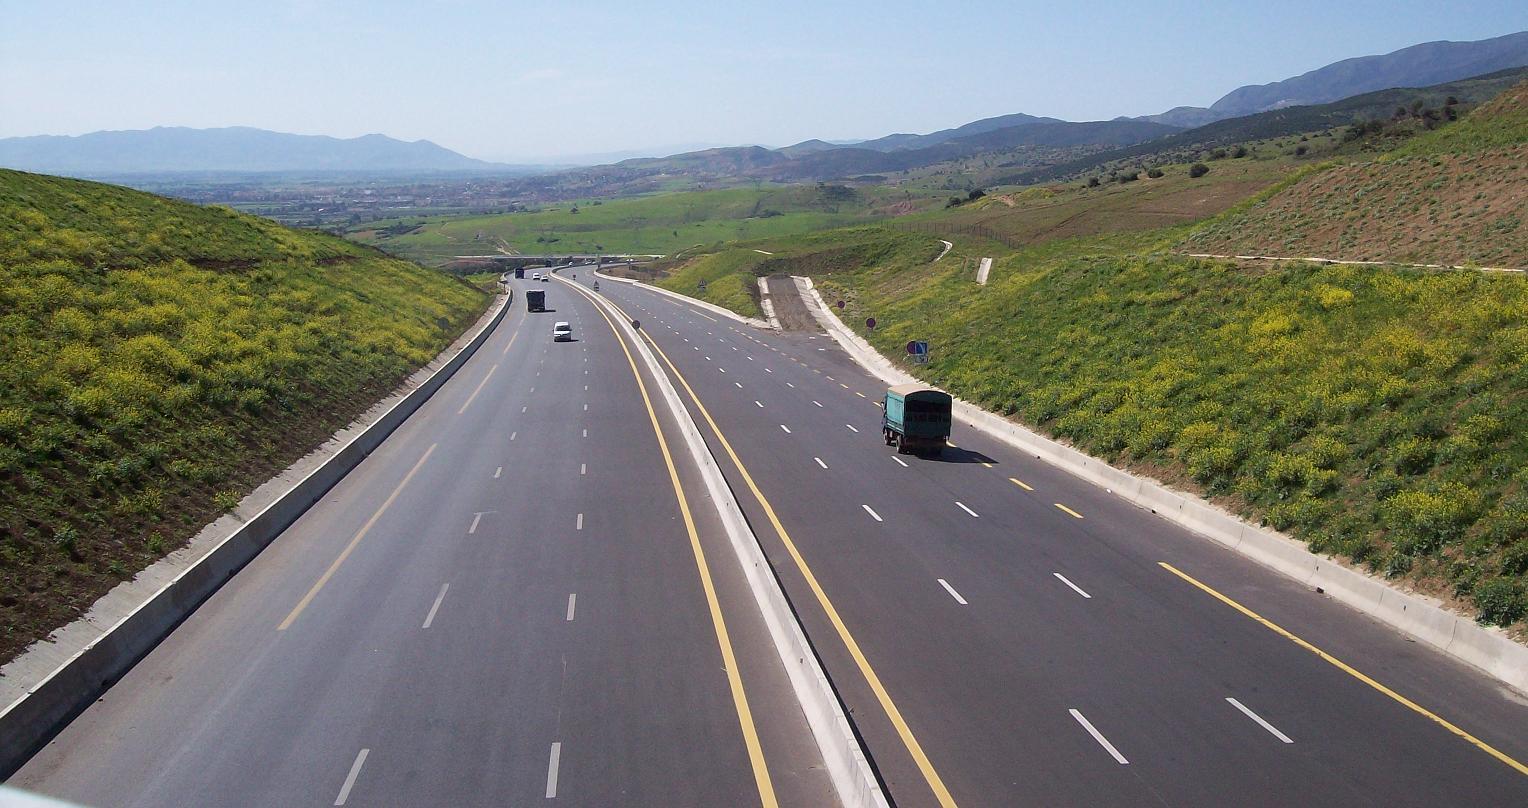 File:Autoroute est ouest ghomri2.JPG - Wikimedia Commons